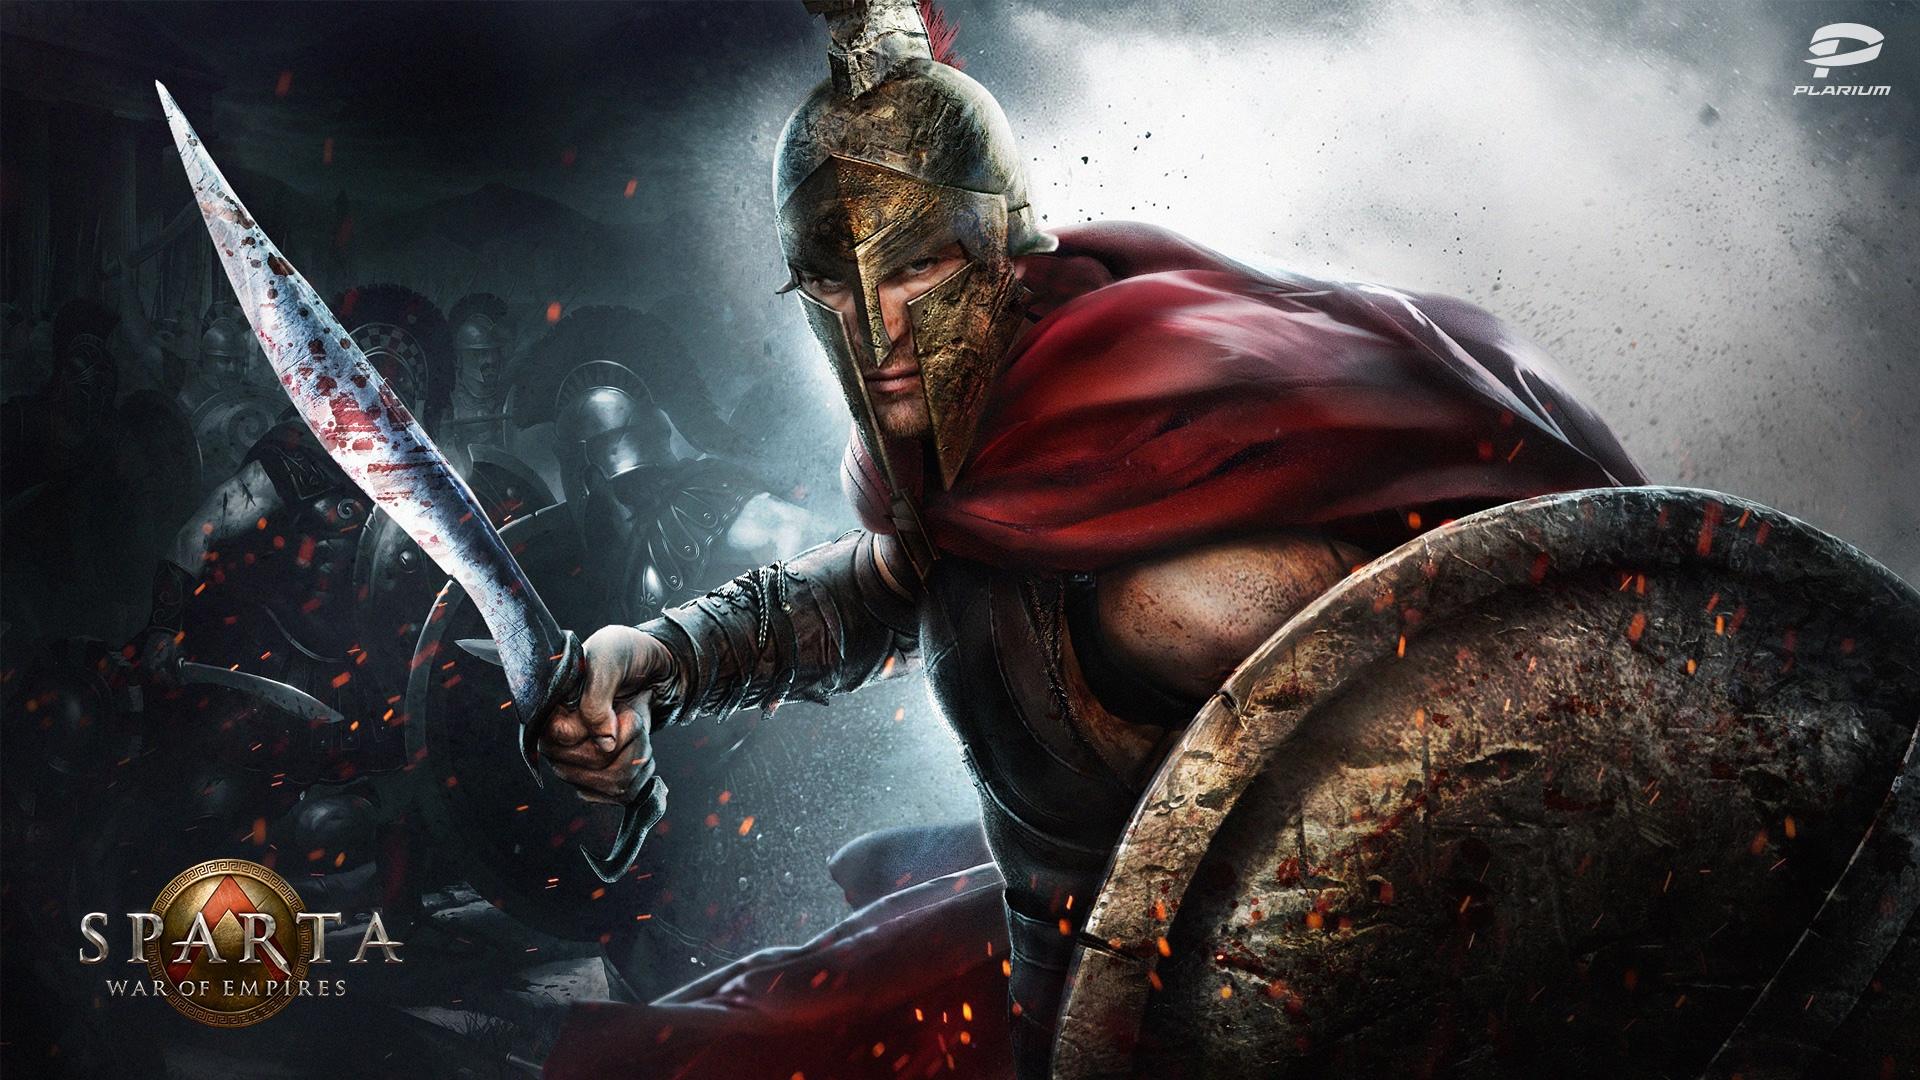 Sparta: War of Empires - Screenshot-Galerie | pressakey.com